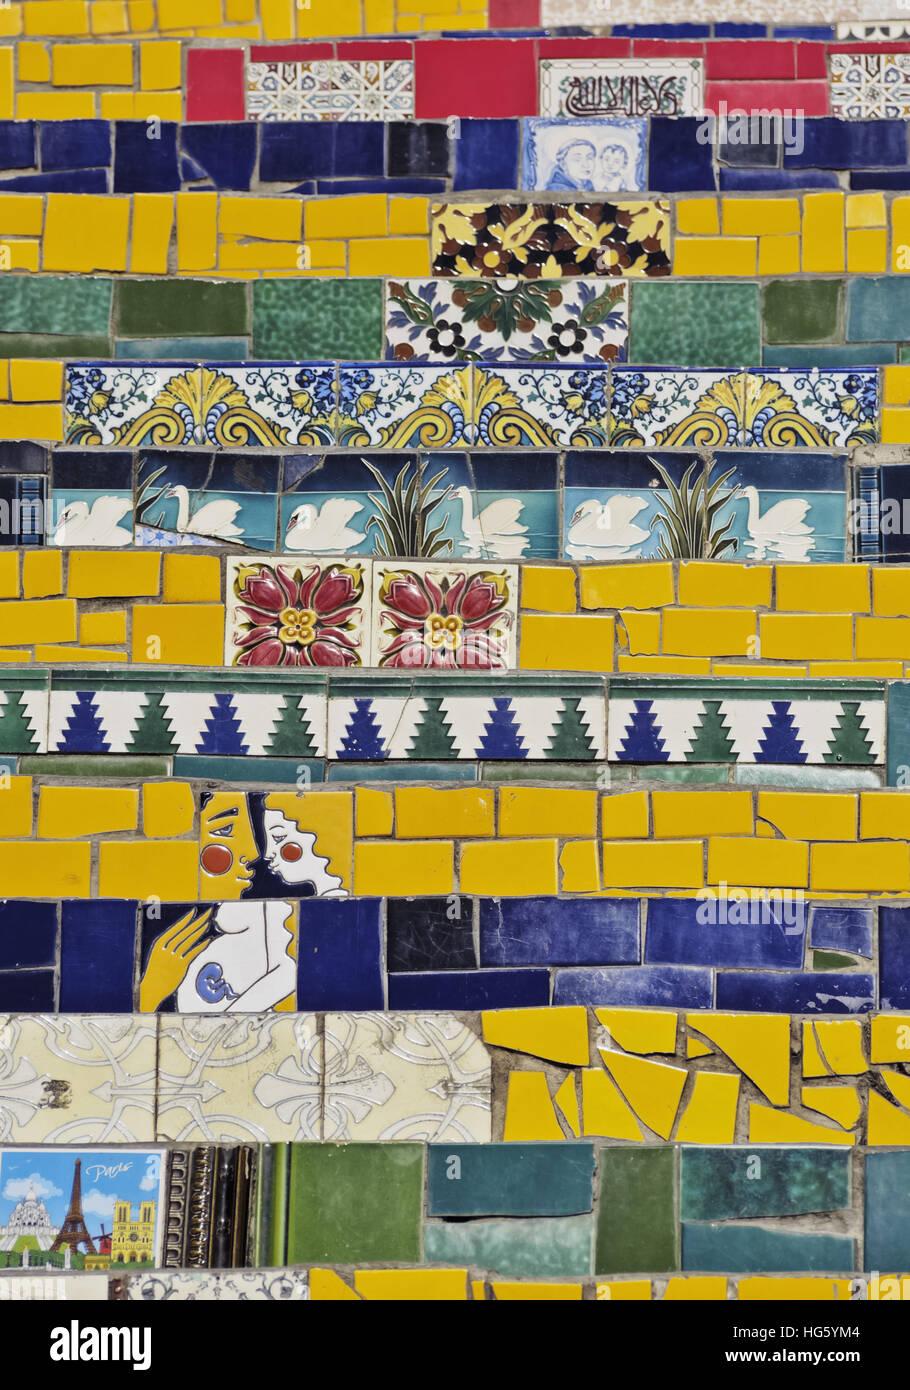 Brazil, City of Rio de Janeiro, Detailed view of the Selaron Steps connecting Lapa and Santa Teresa Neighbourhoods. - Stock Image